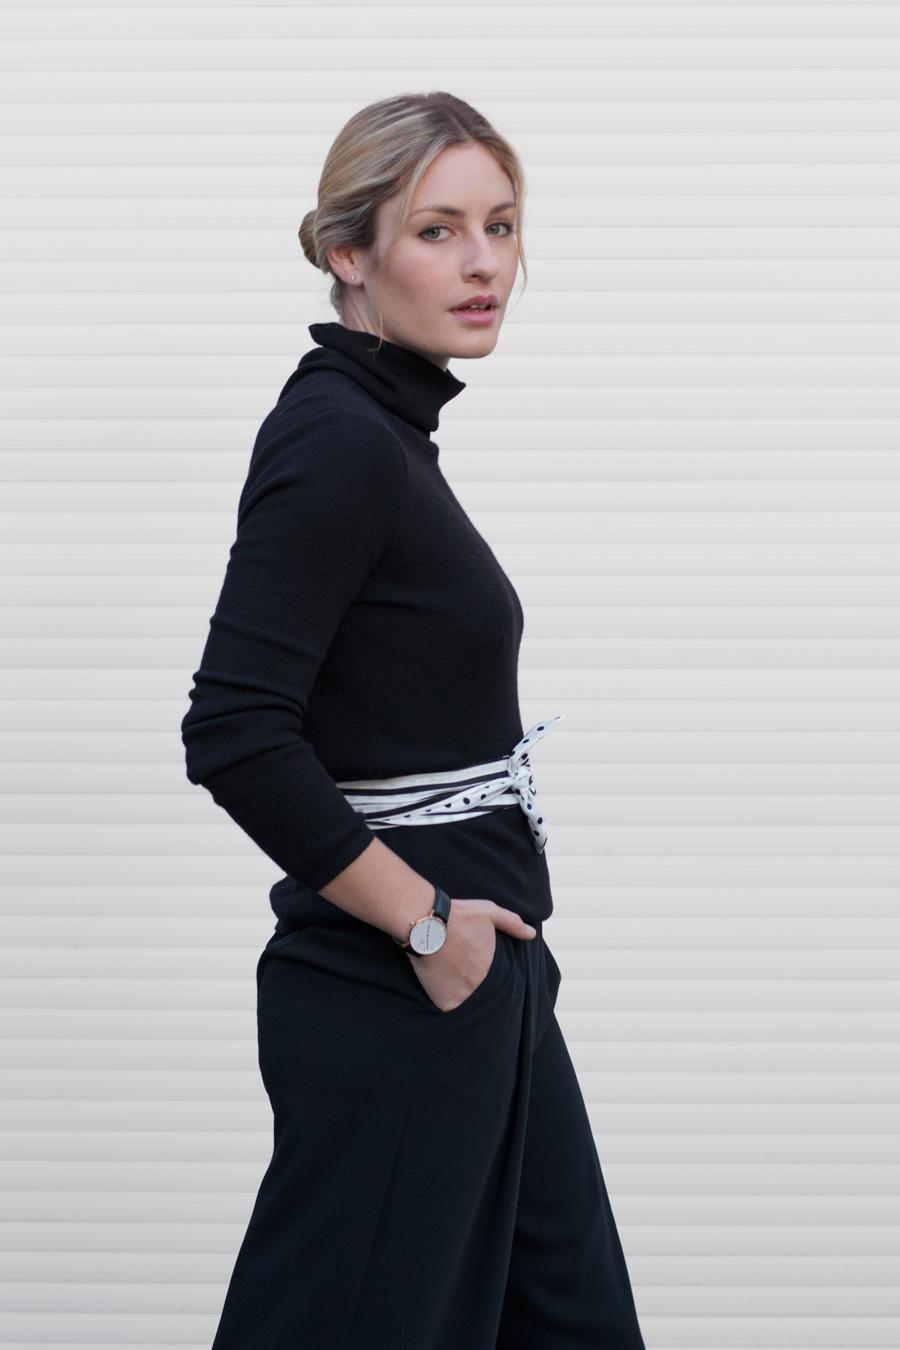 skinny-scarf-styling-tips1.jpg